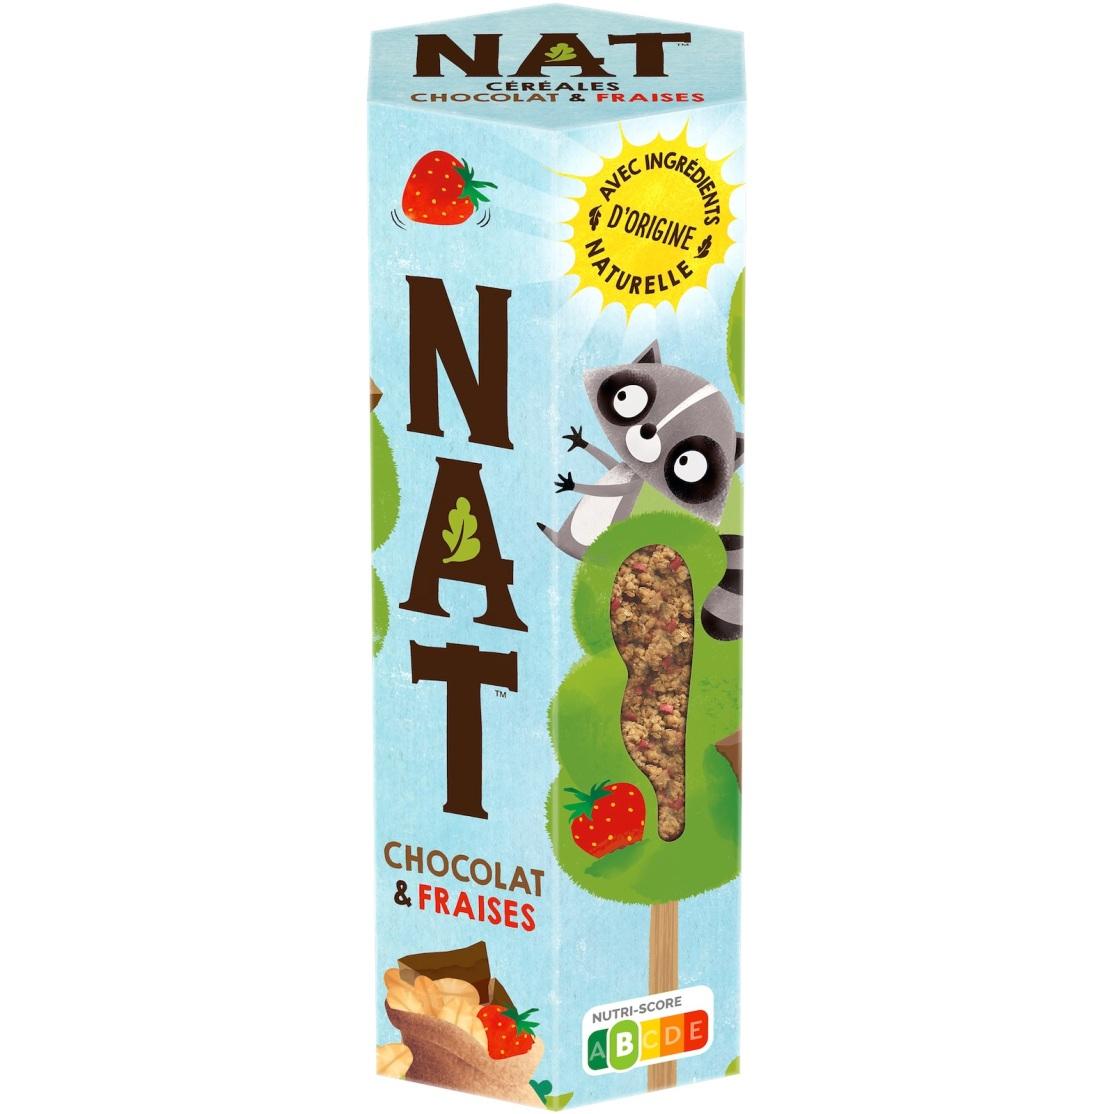 LRCEREALES NAT_CHOCOLAT FRAISES - copie